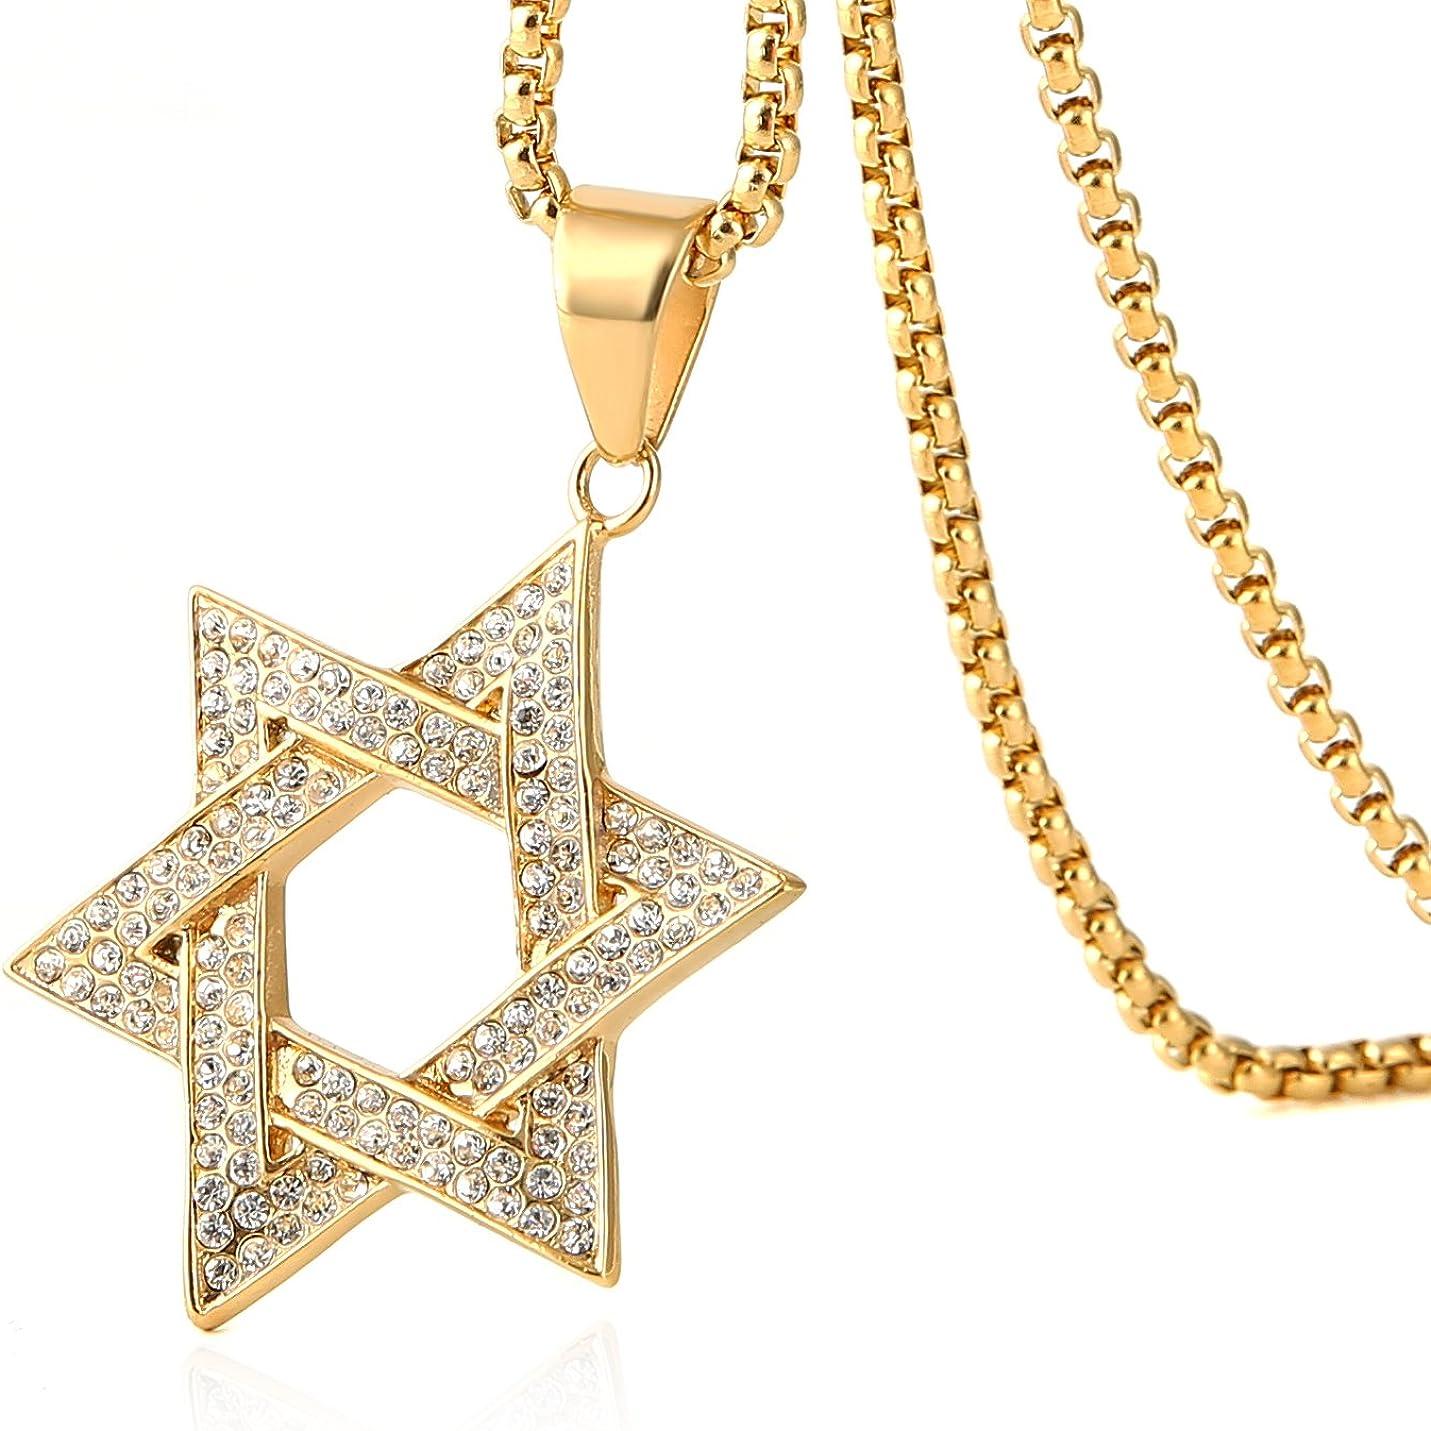 Metal Color: 50cm, Main Stone Color: Gold Color Davitu European Style Bullet Pendant Necklace Hip Hop Jewelry Mens Stainless Steel Gold Color Cross Necklaces Collier